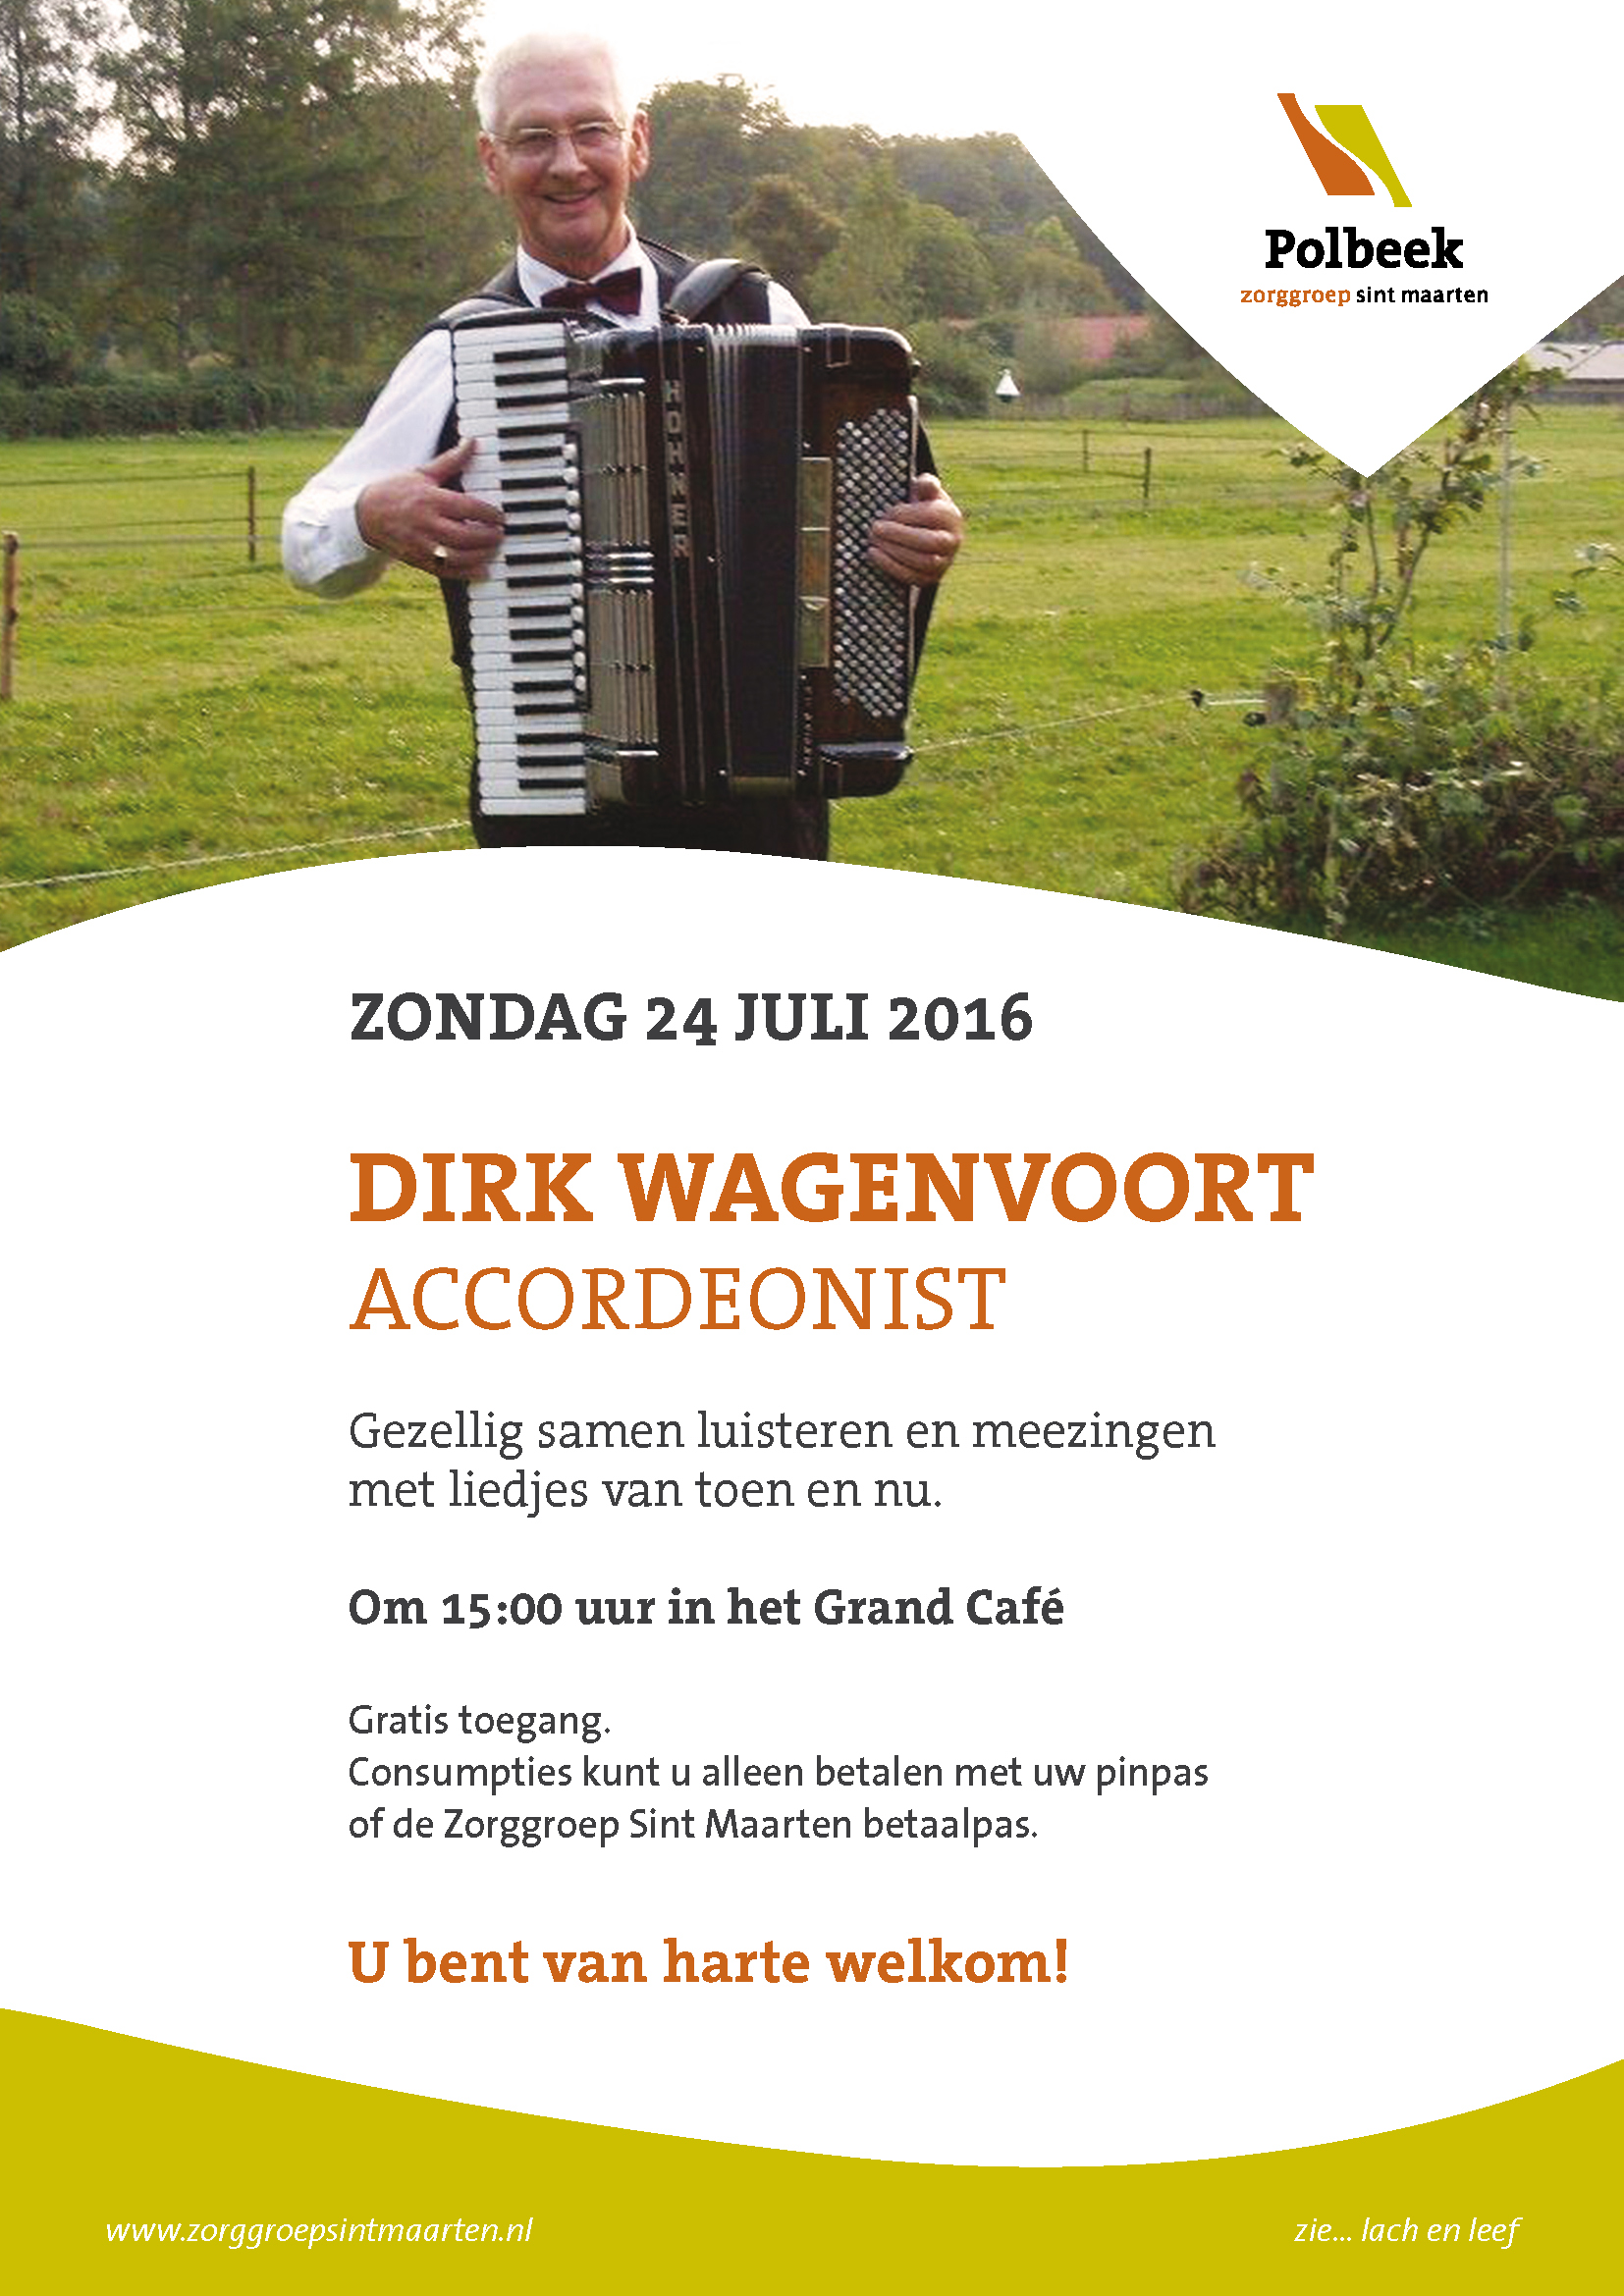 2016 07 12 Poster Polbeek Dick w